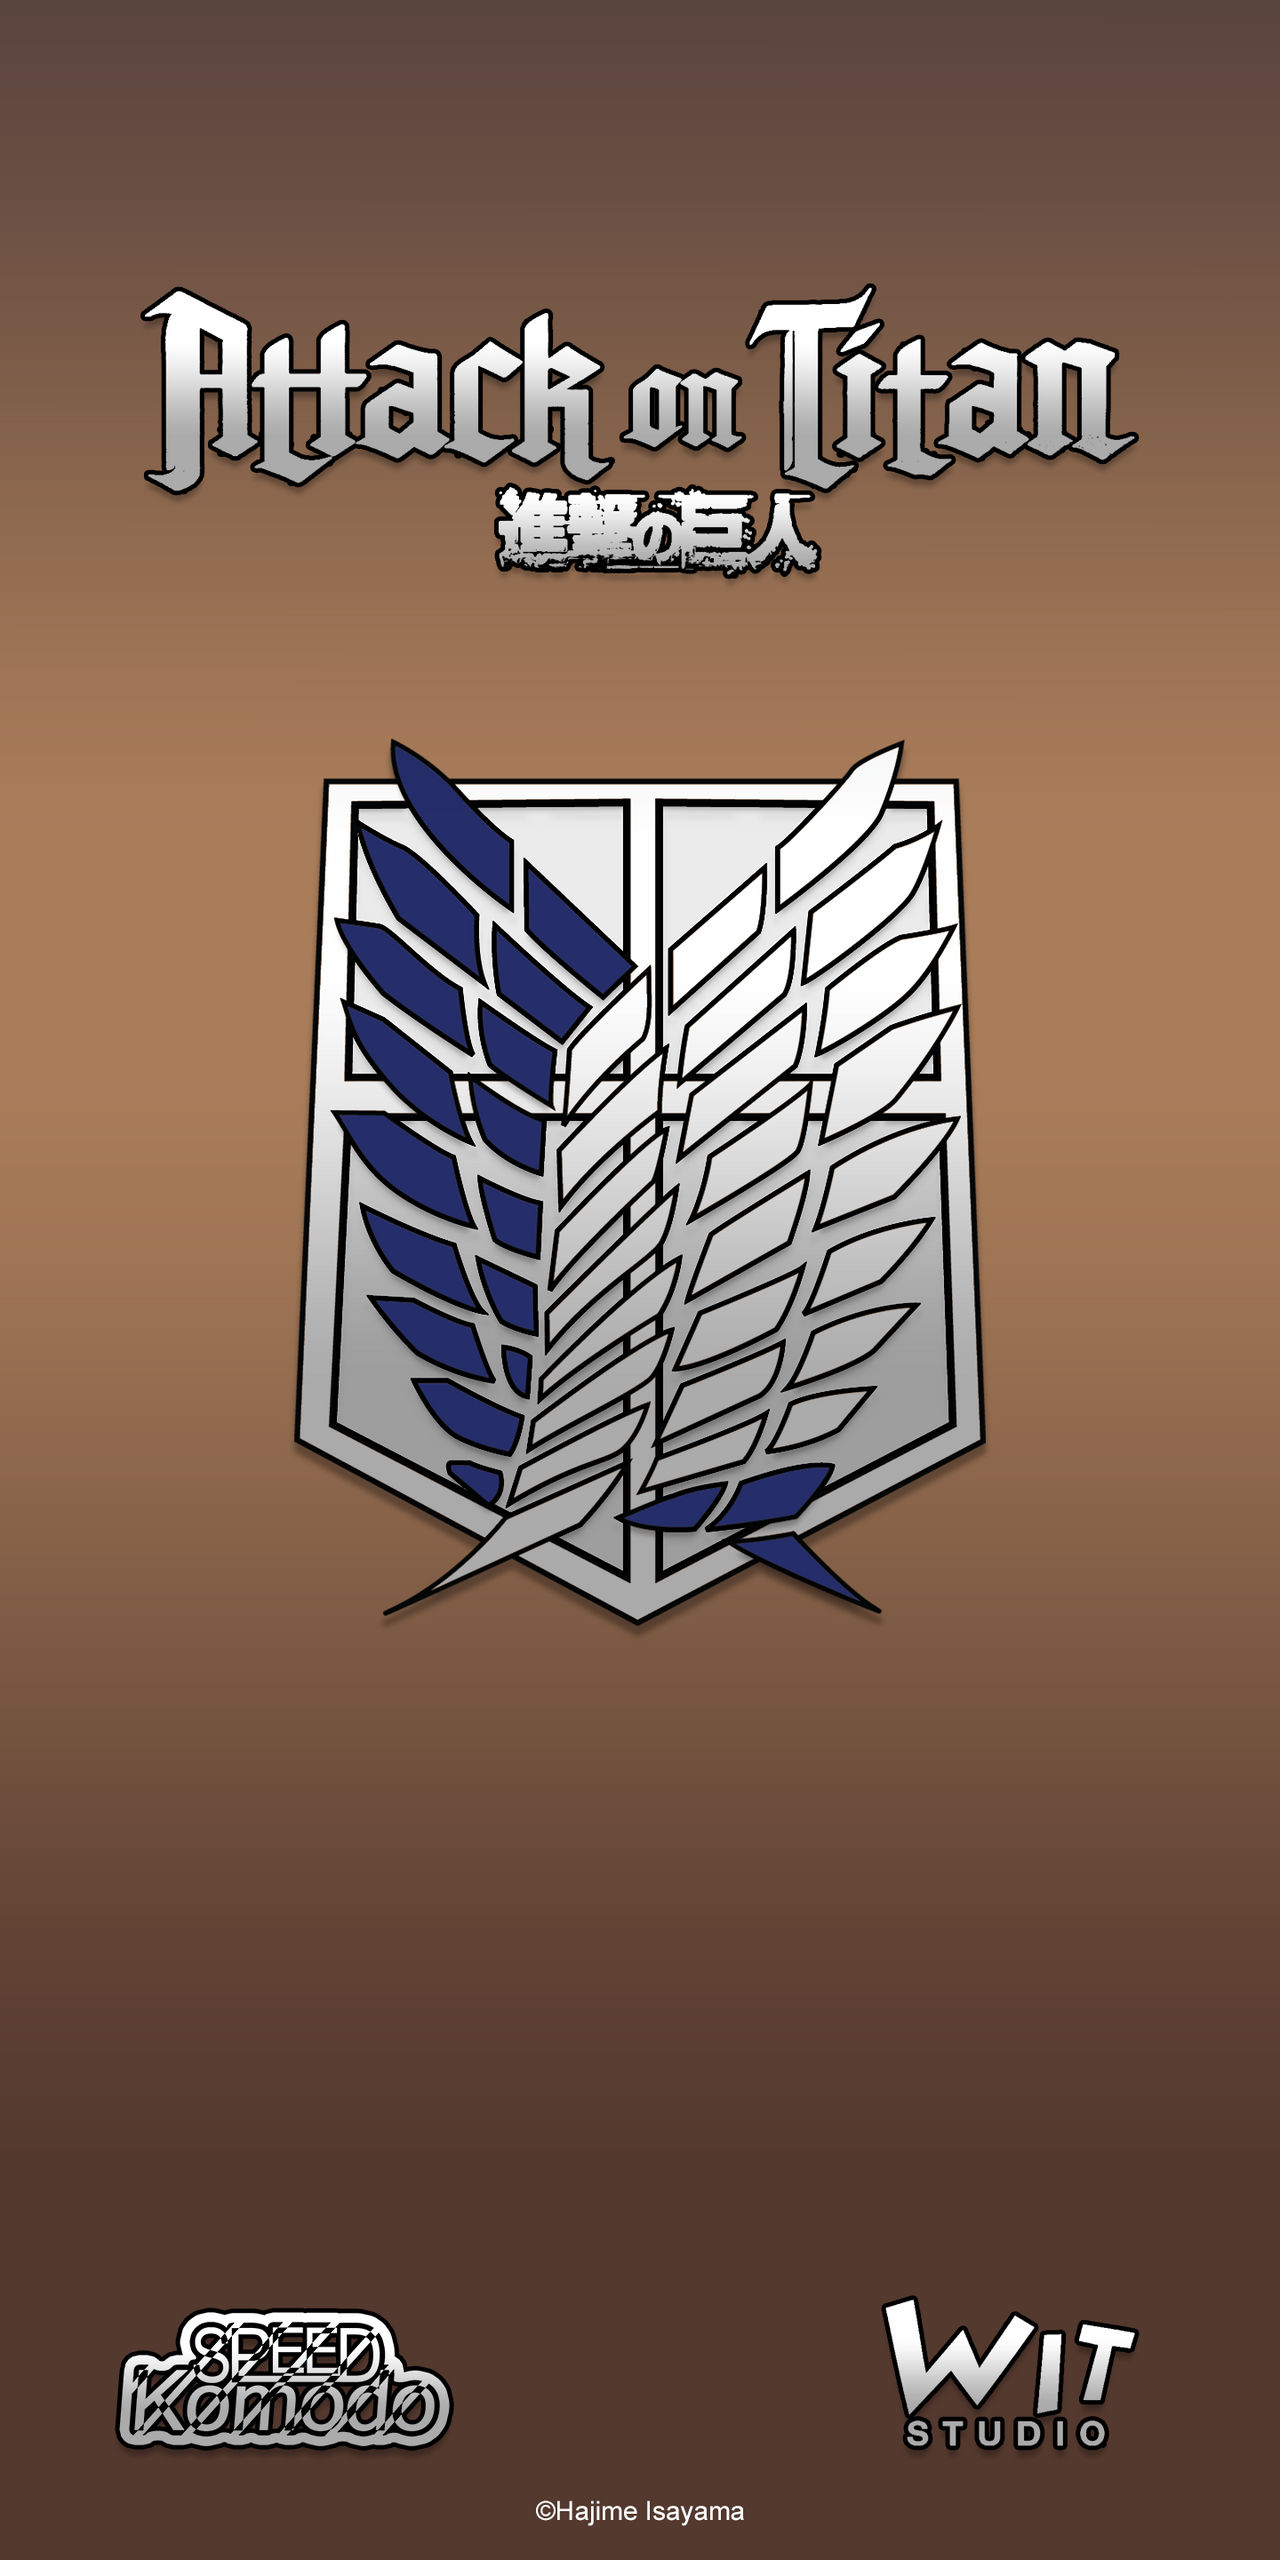 Attack On Titan Scouting Legion Wallpaper By Speedkomodo On